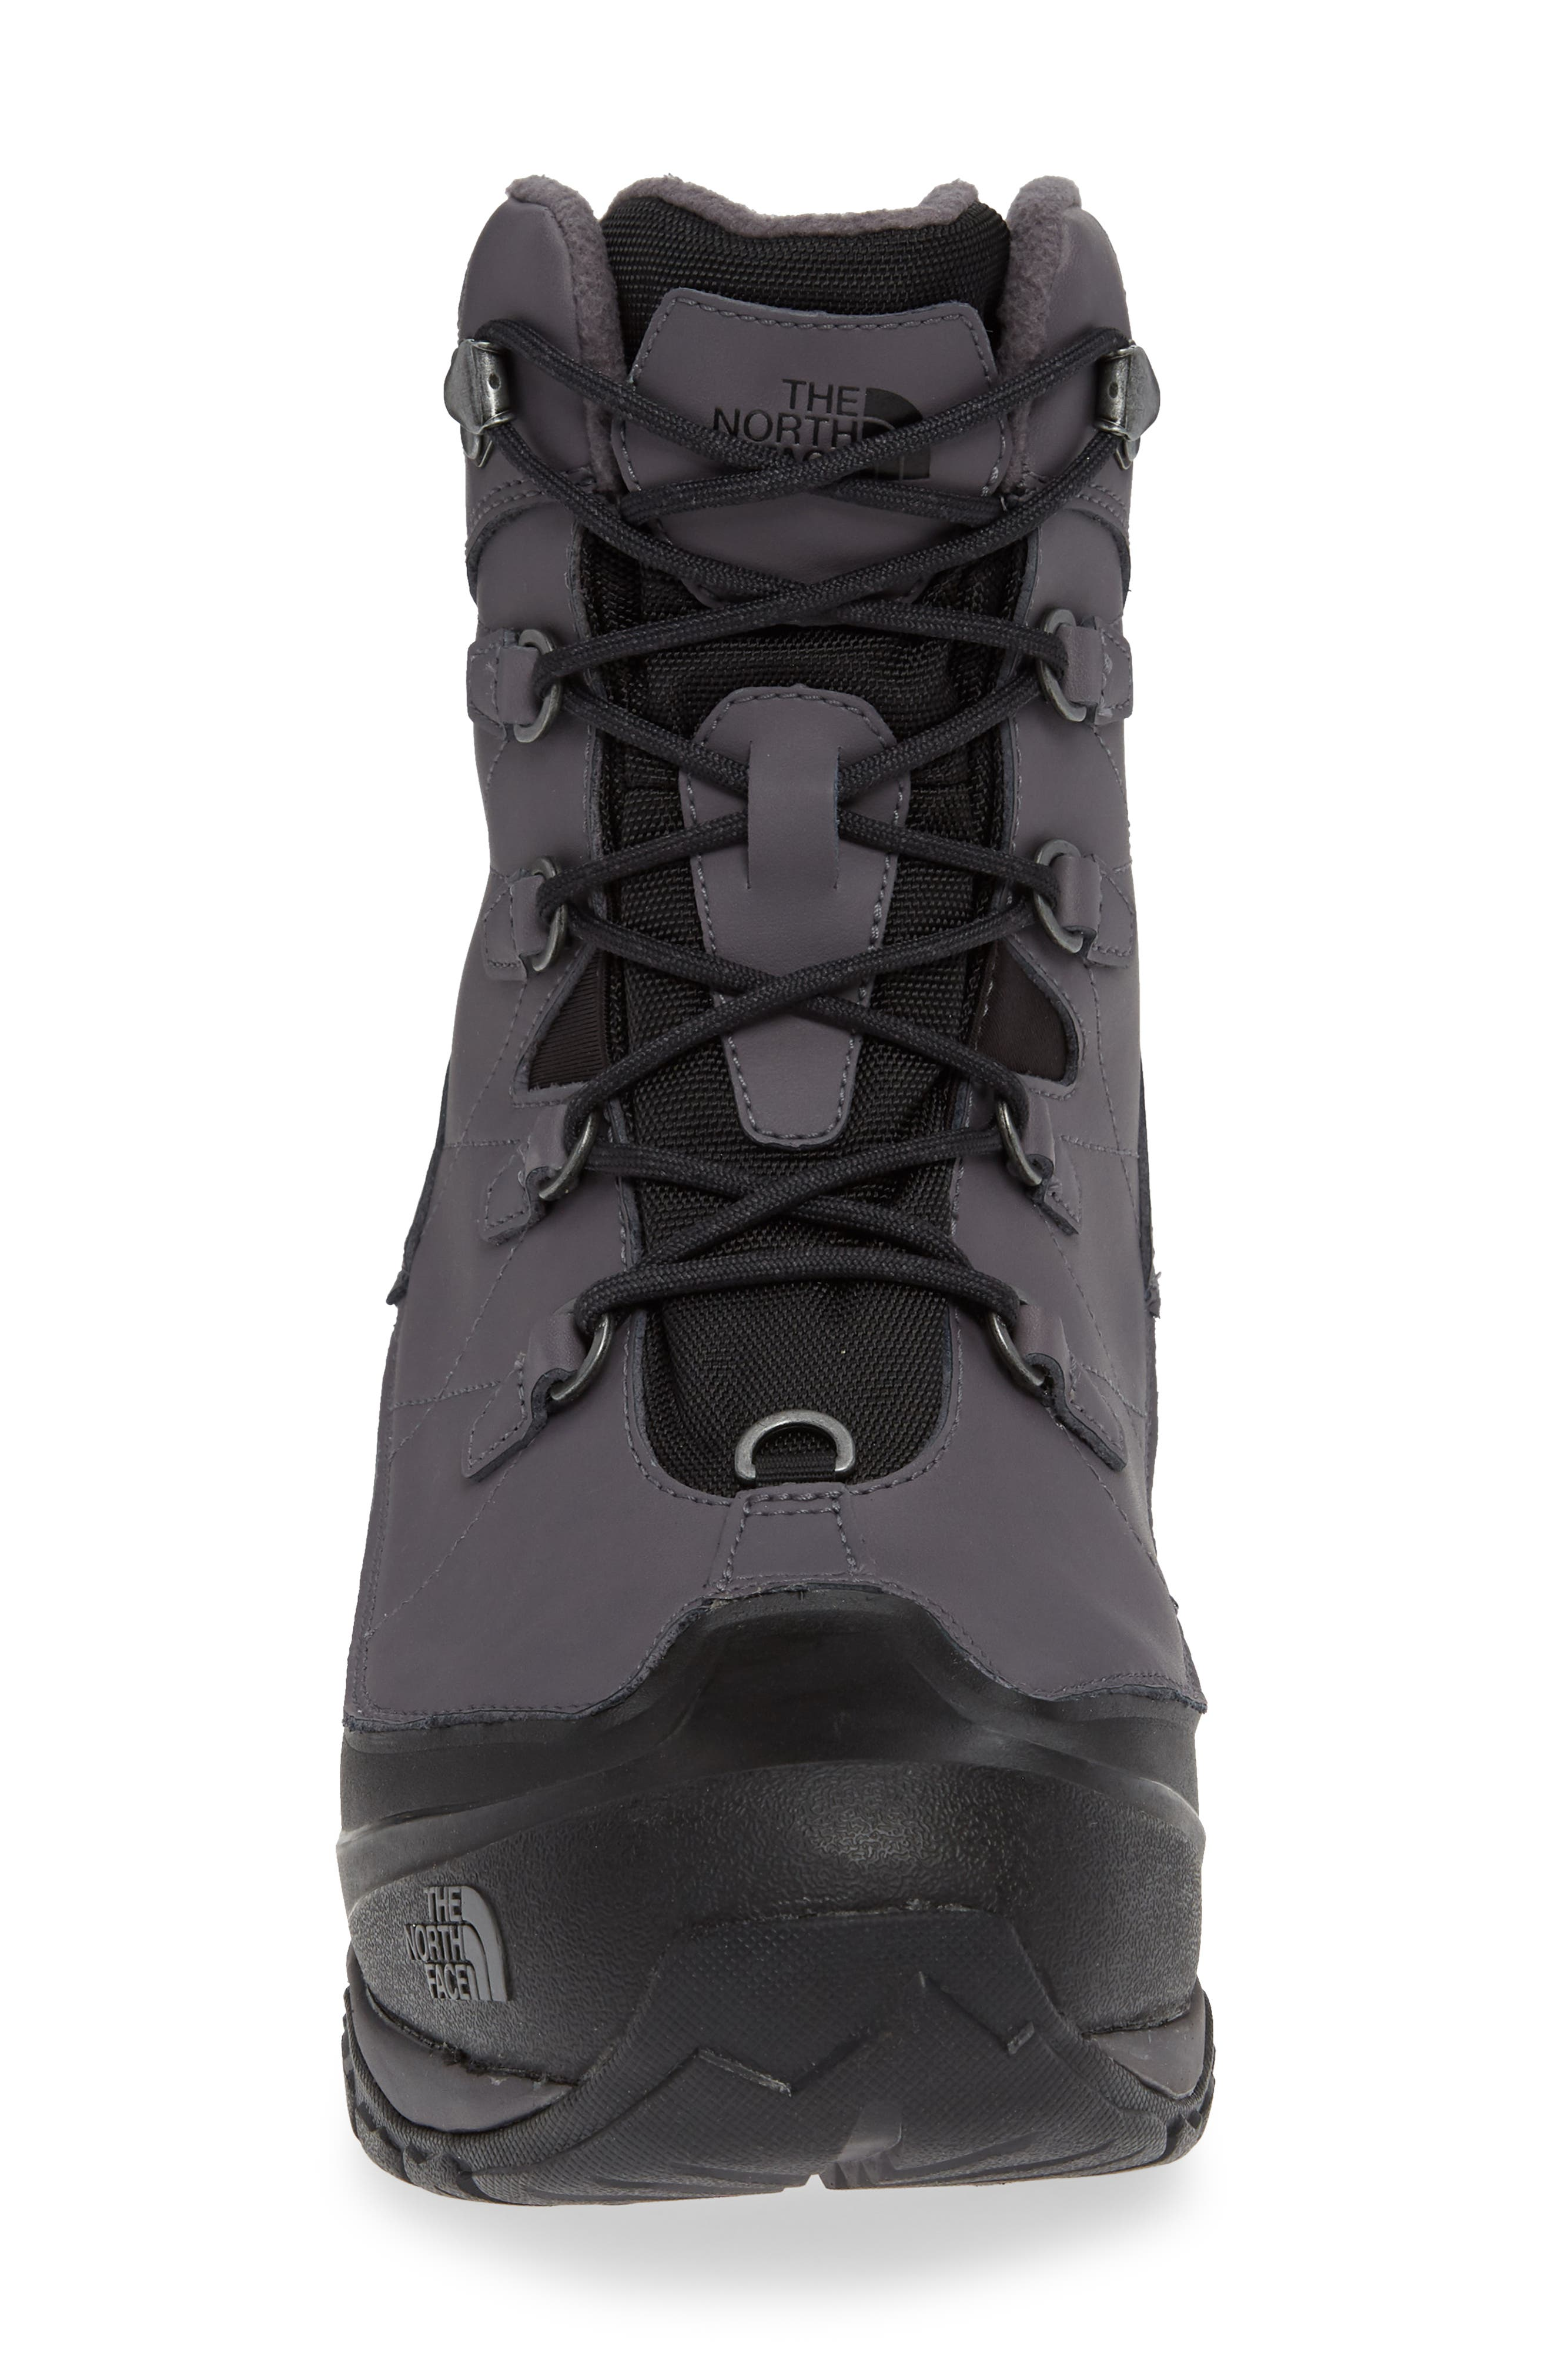 Chilkat Evo Waterproof Insulated Snow Boot,                             Alternate thumbnail 4, color,                             BLACKENED PEARL/ PHANTOM GREY